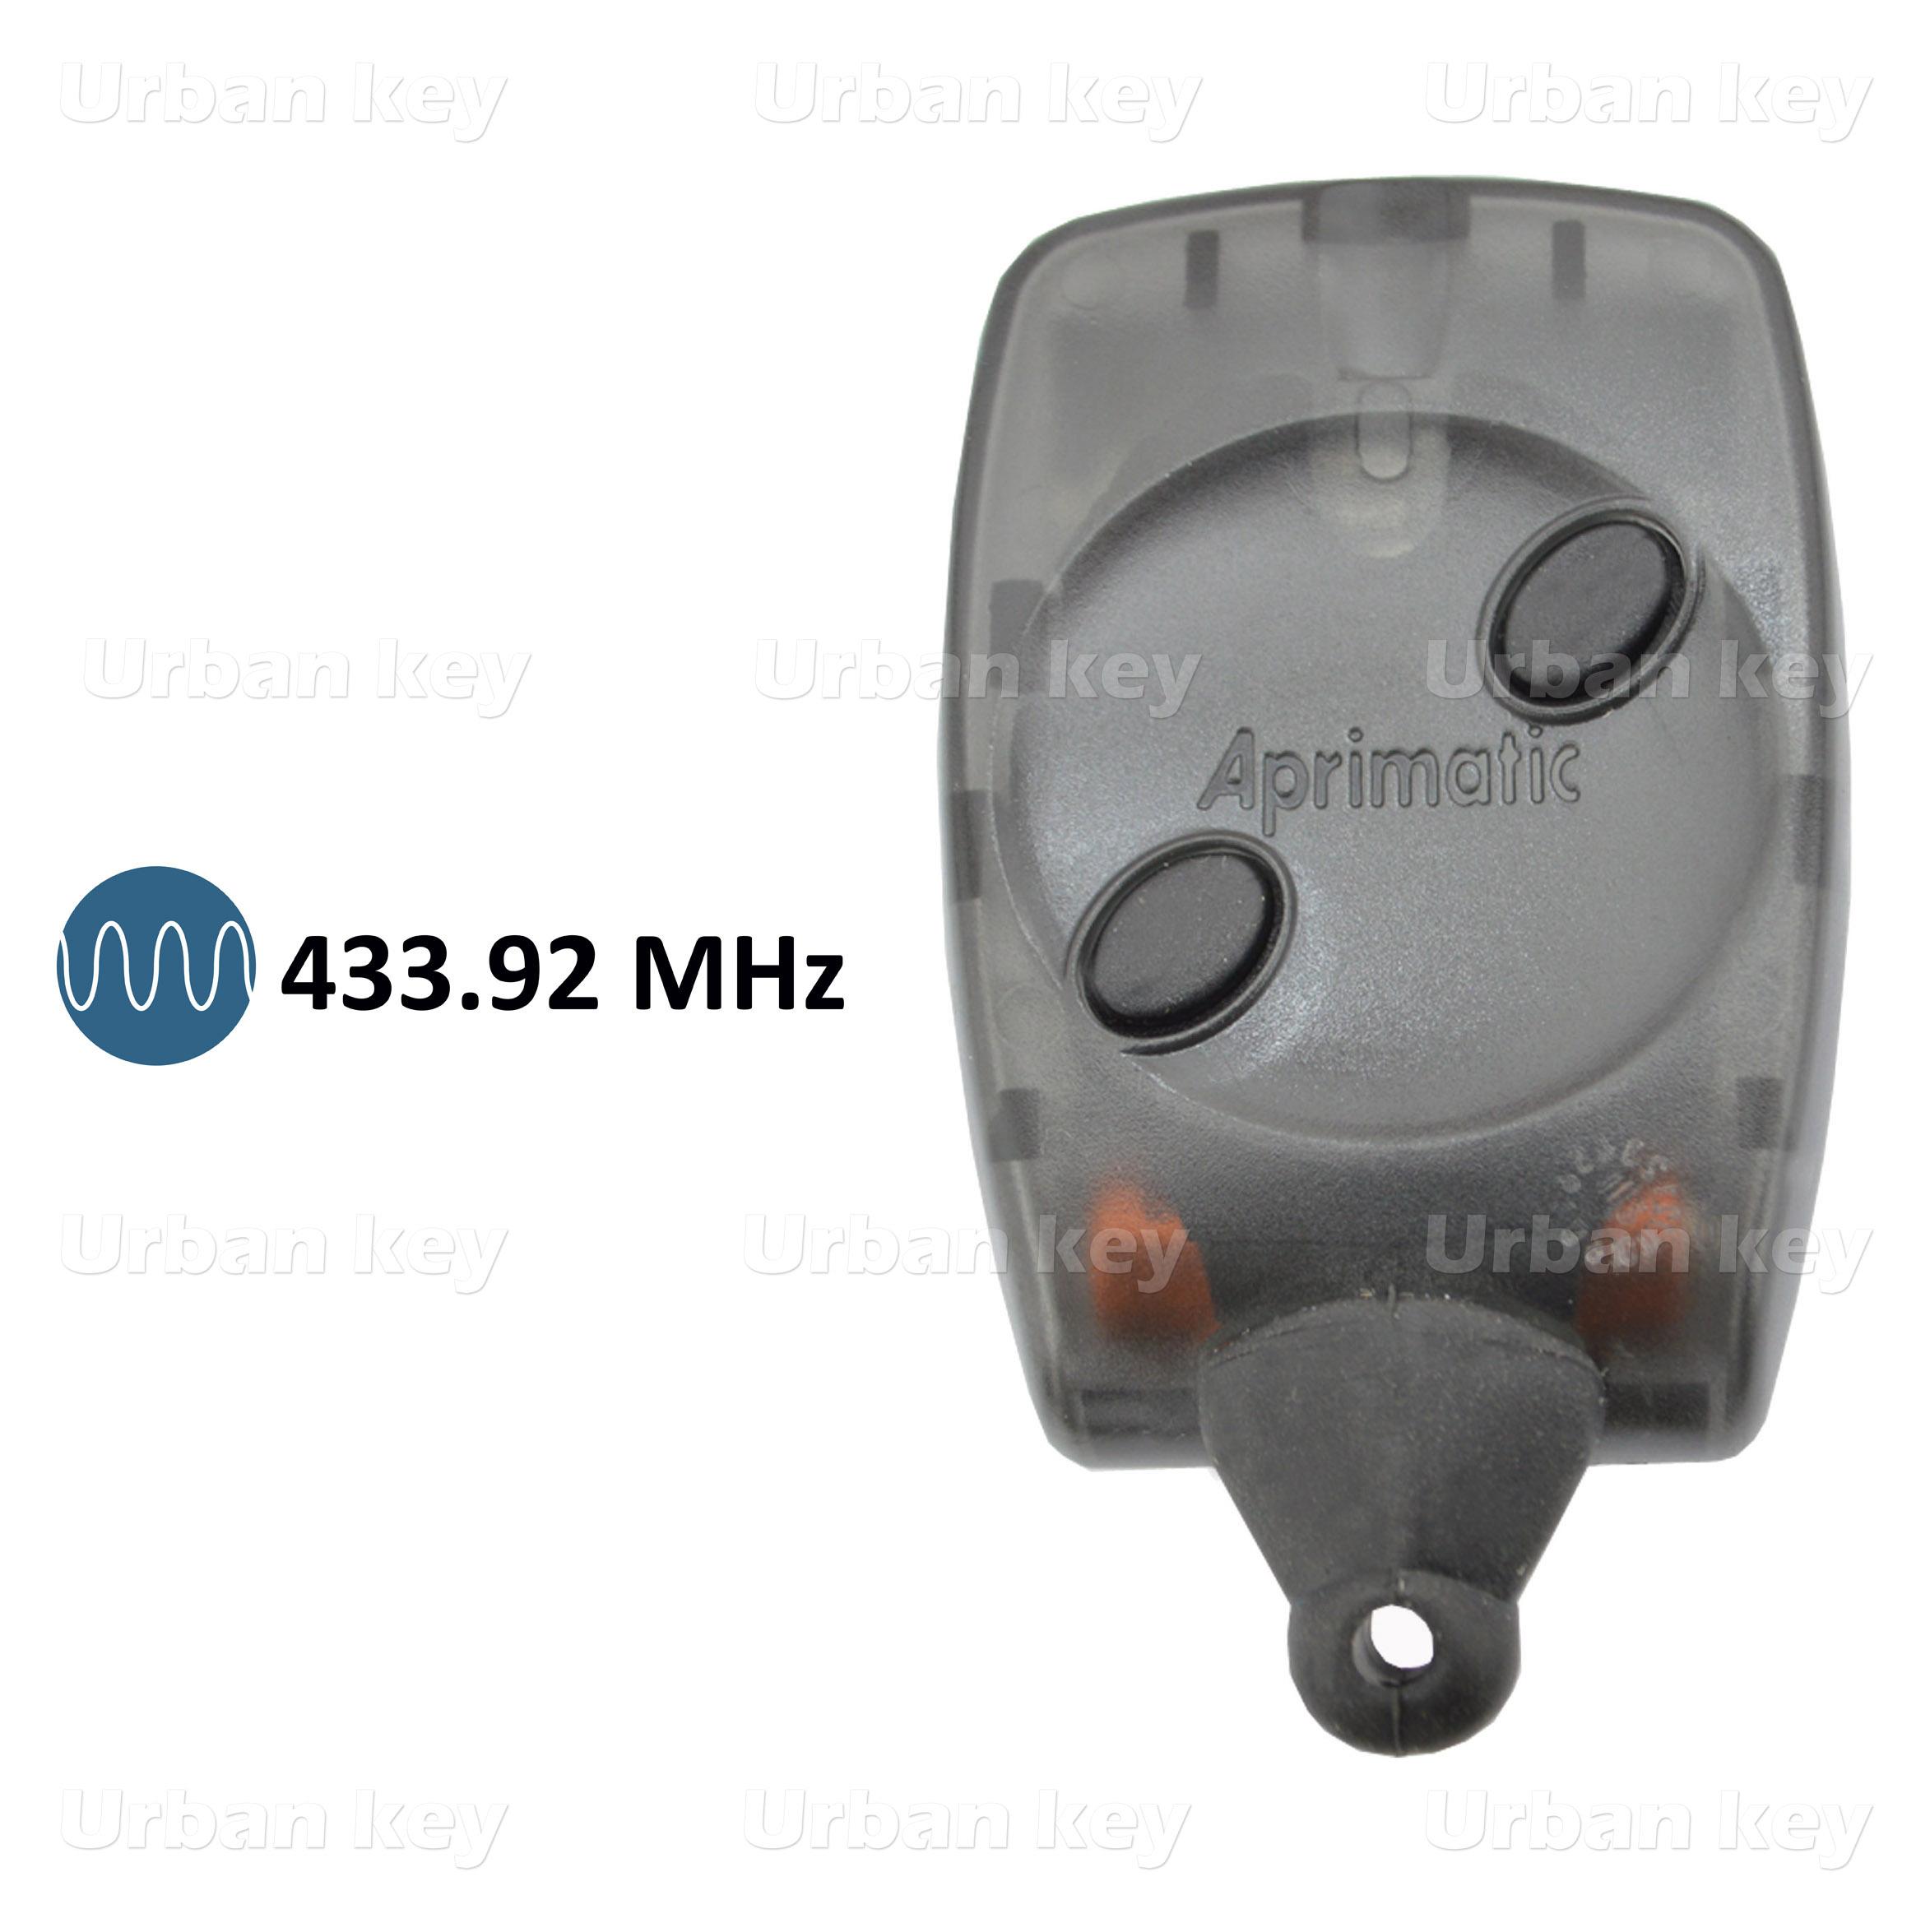 EMISSOR APRIMATIC TX2M  PRETO 433 MHz